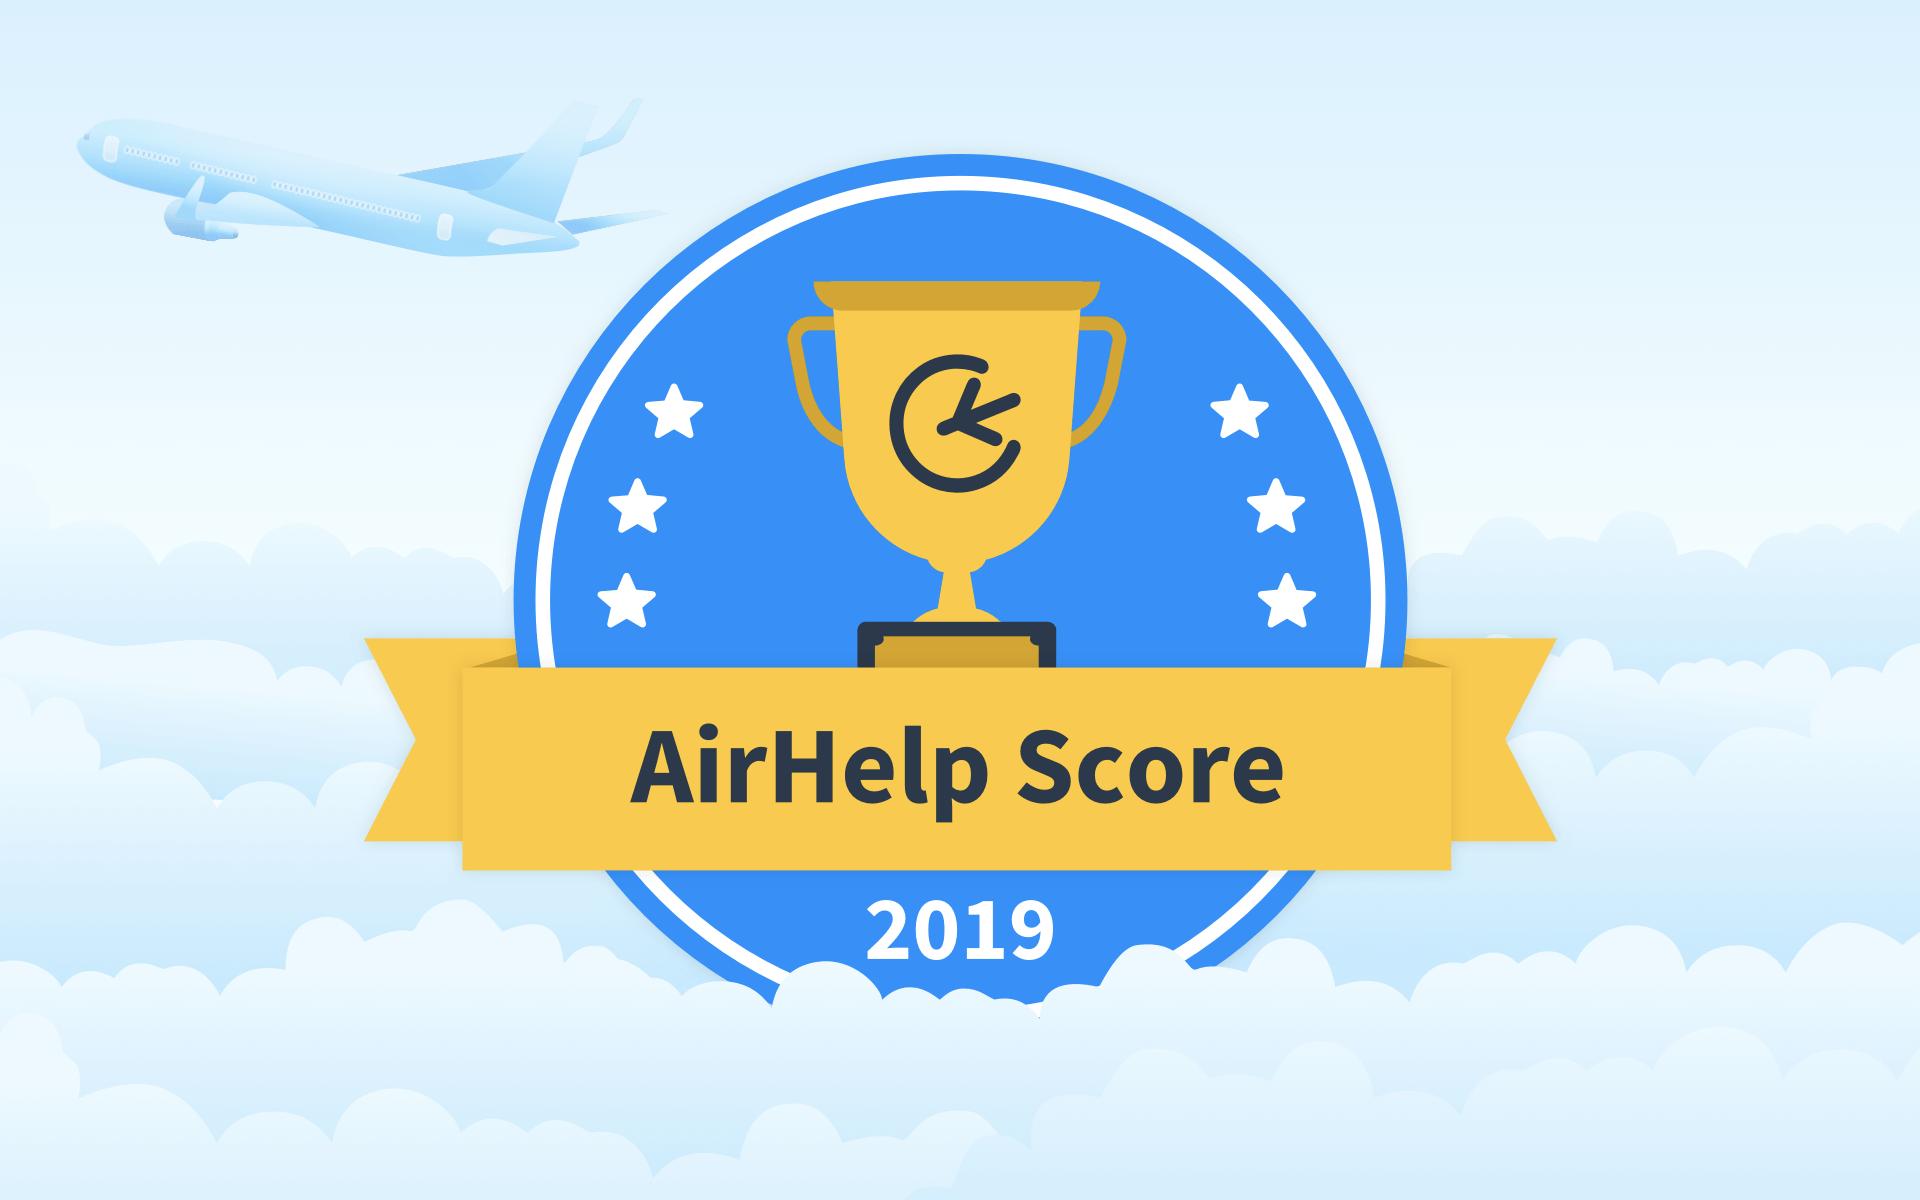 AirHelp score 2019 illustration